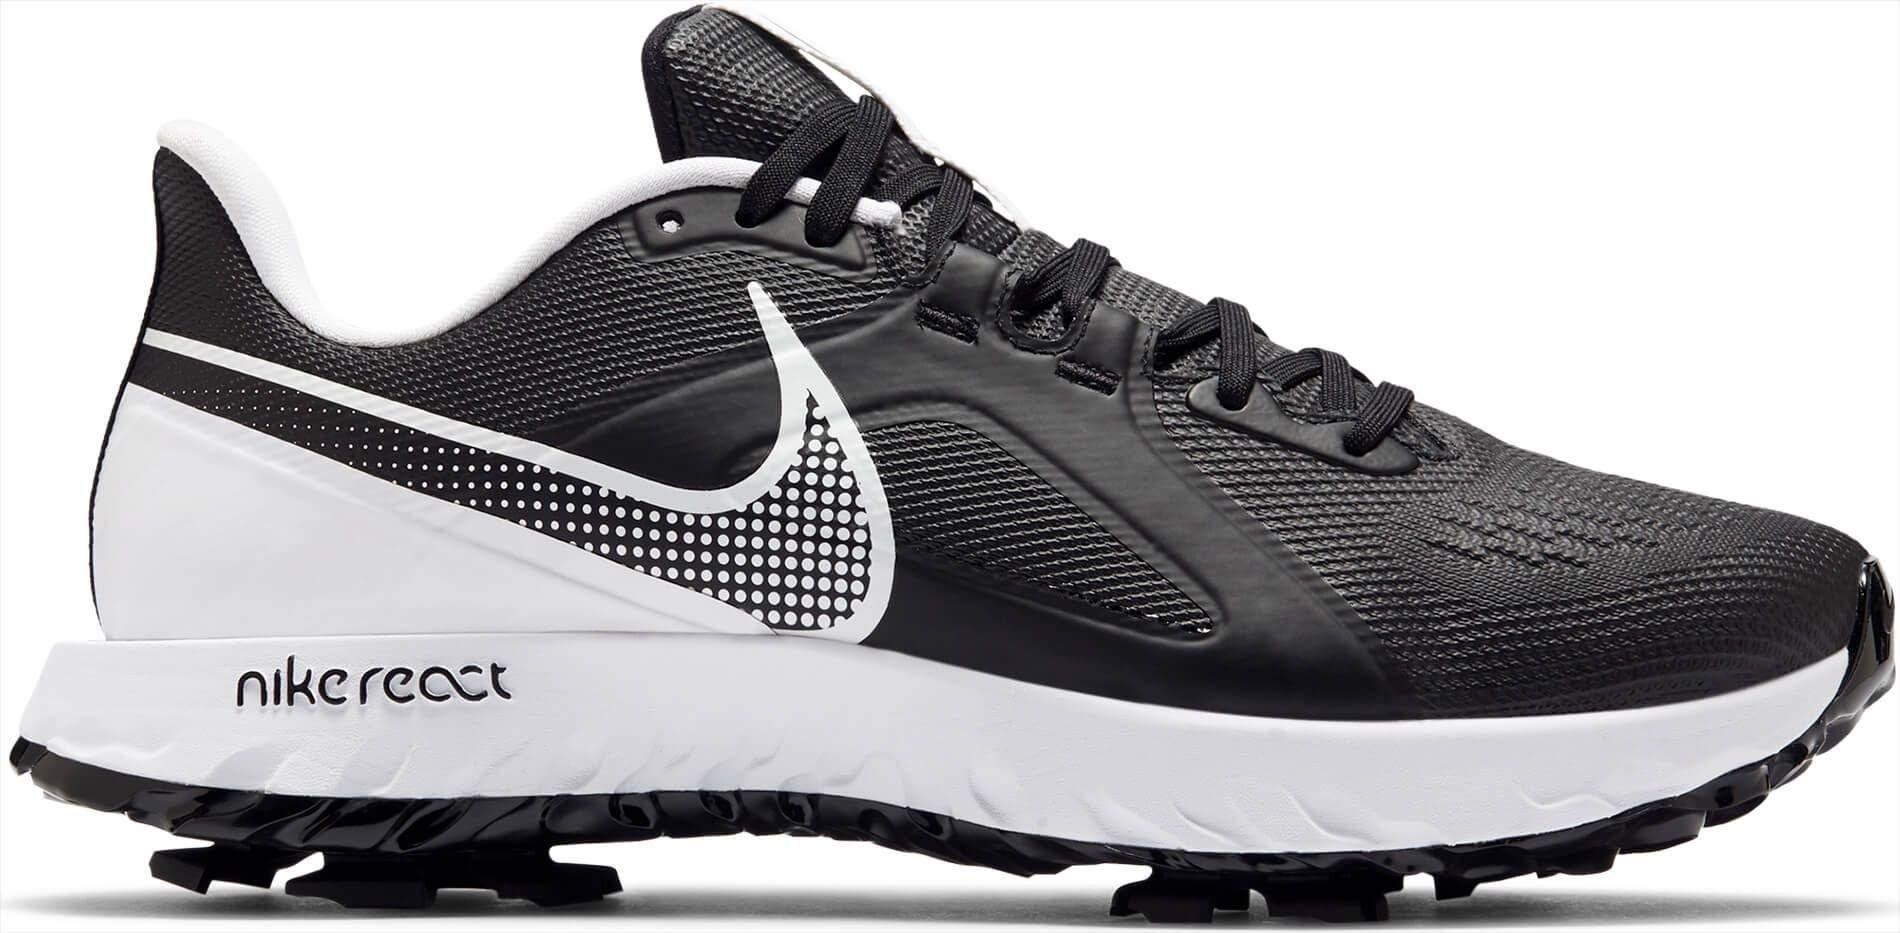 Nike React Infinity Pro Golf Shoes 2021 - Black/White